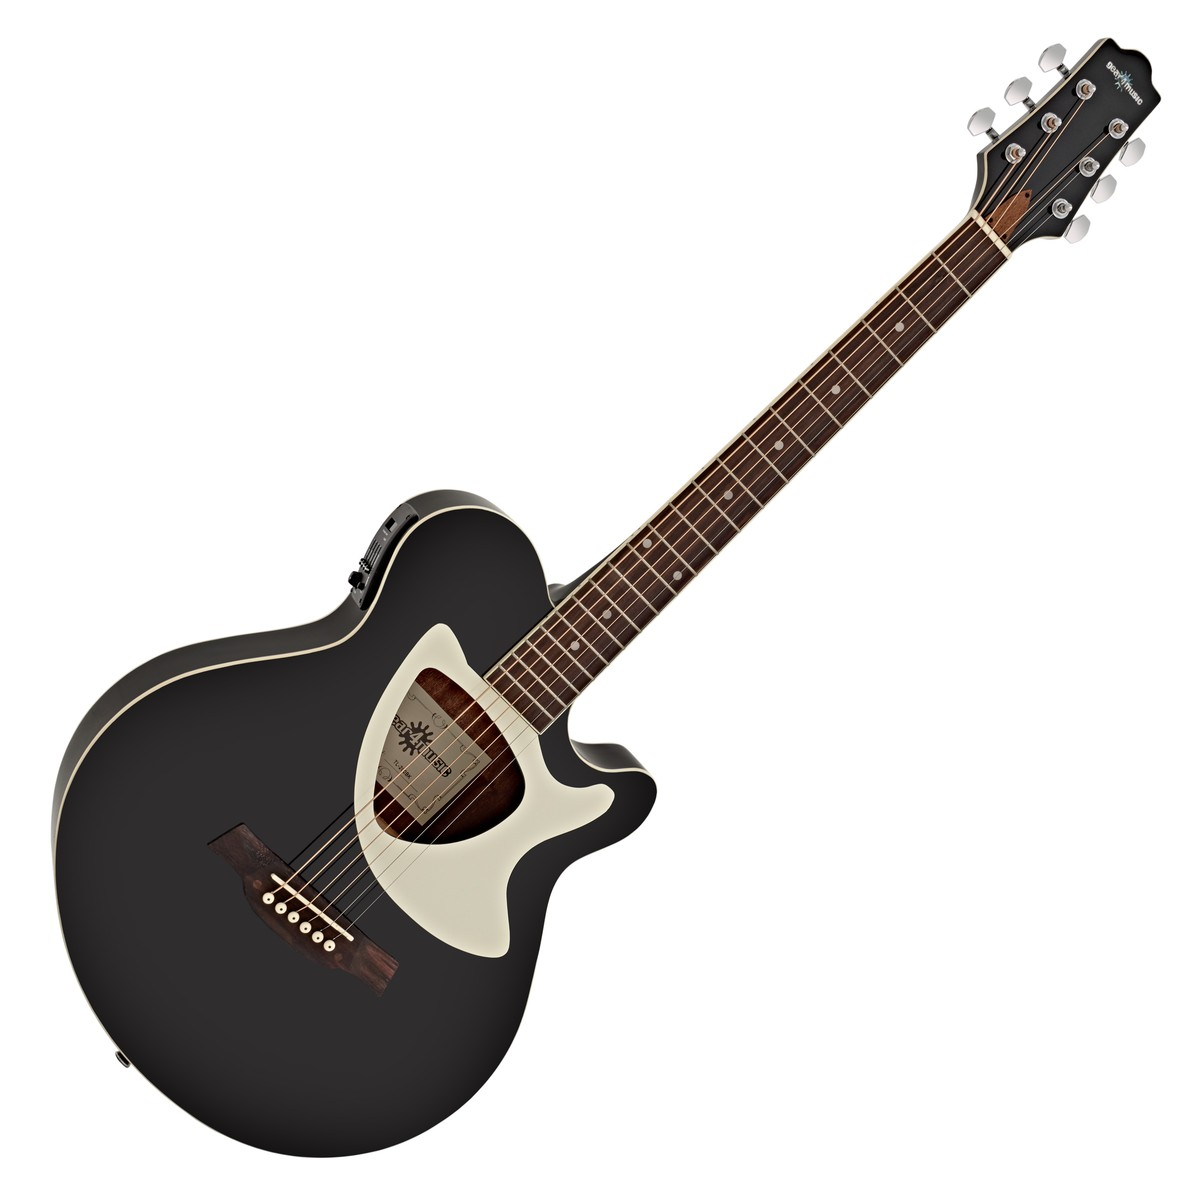 guitare lectro acoustique thinline deluxe pacl ampli. Black Bedroom Furniture Sets. Home Design Ideas